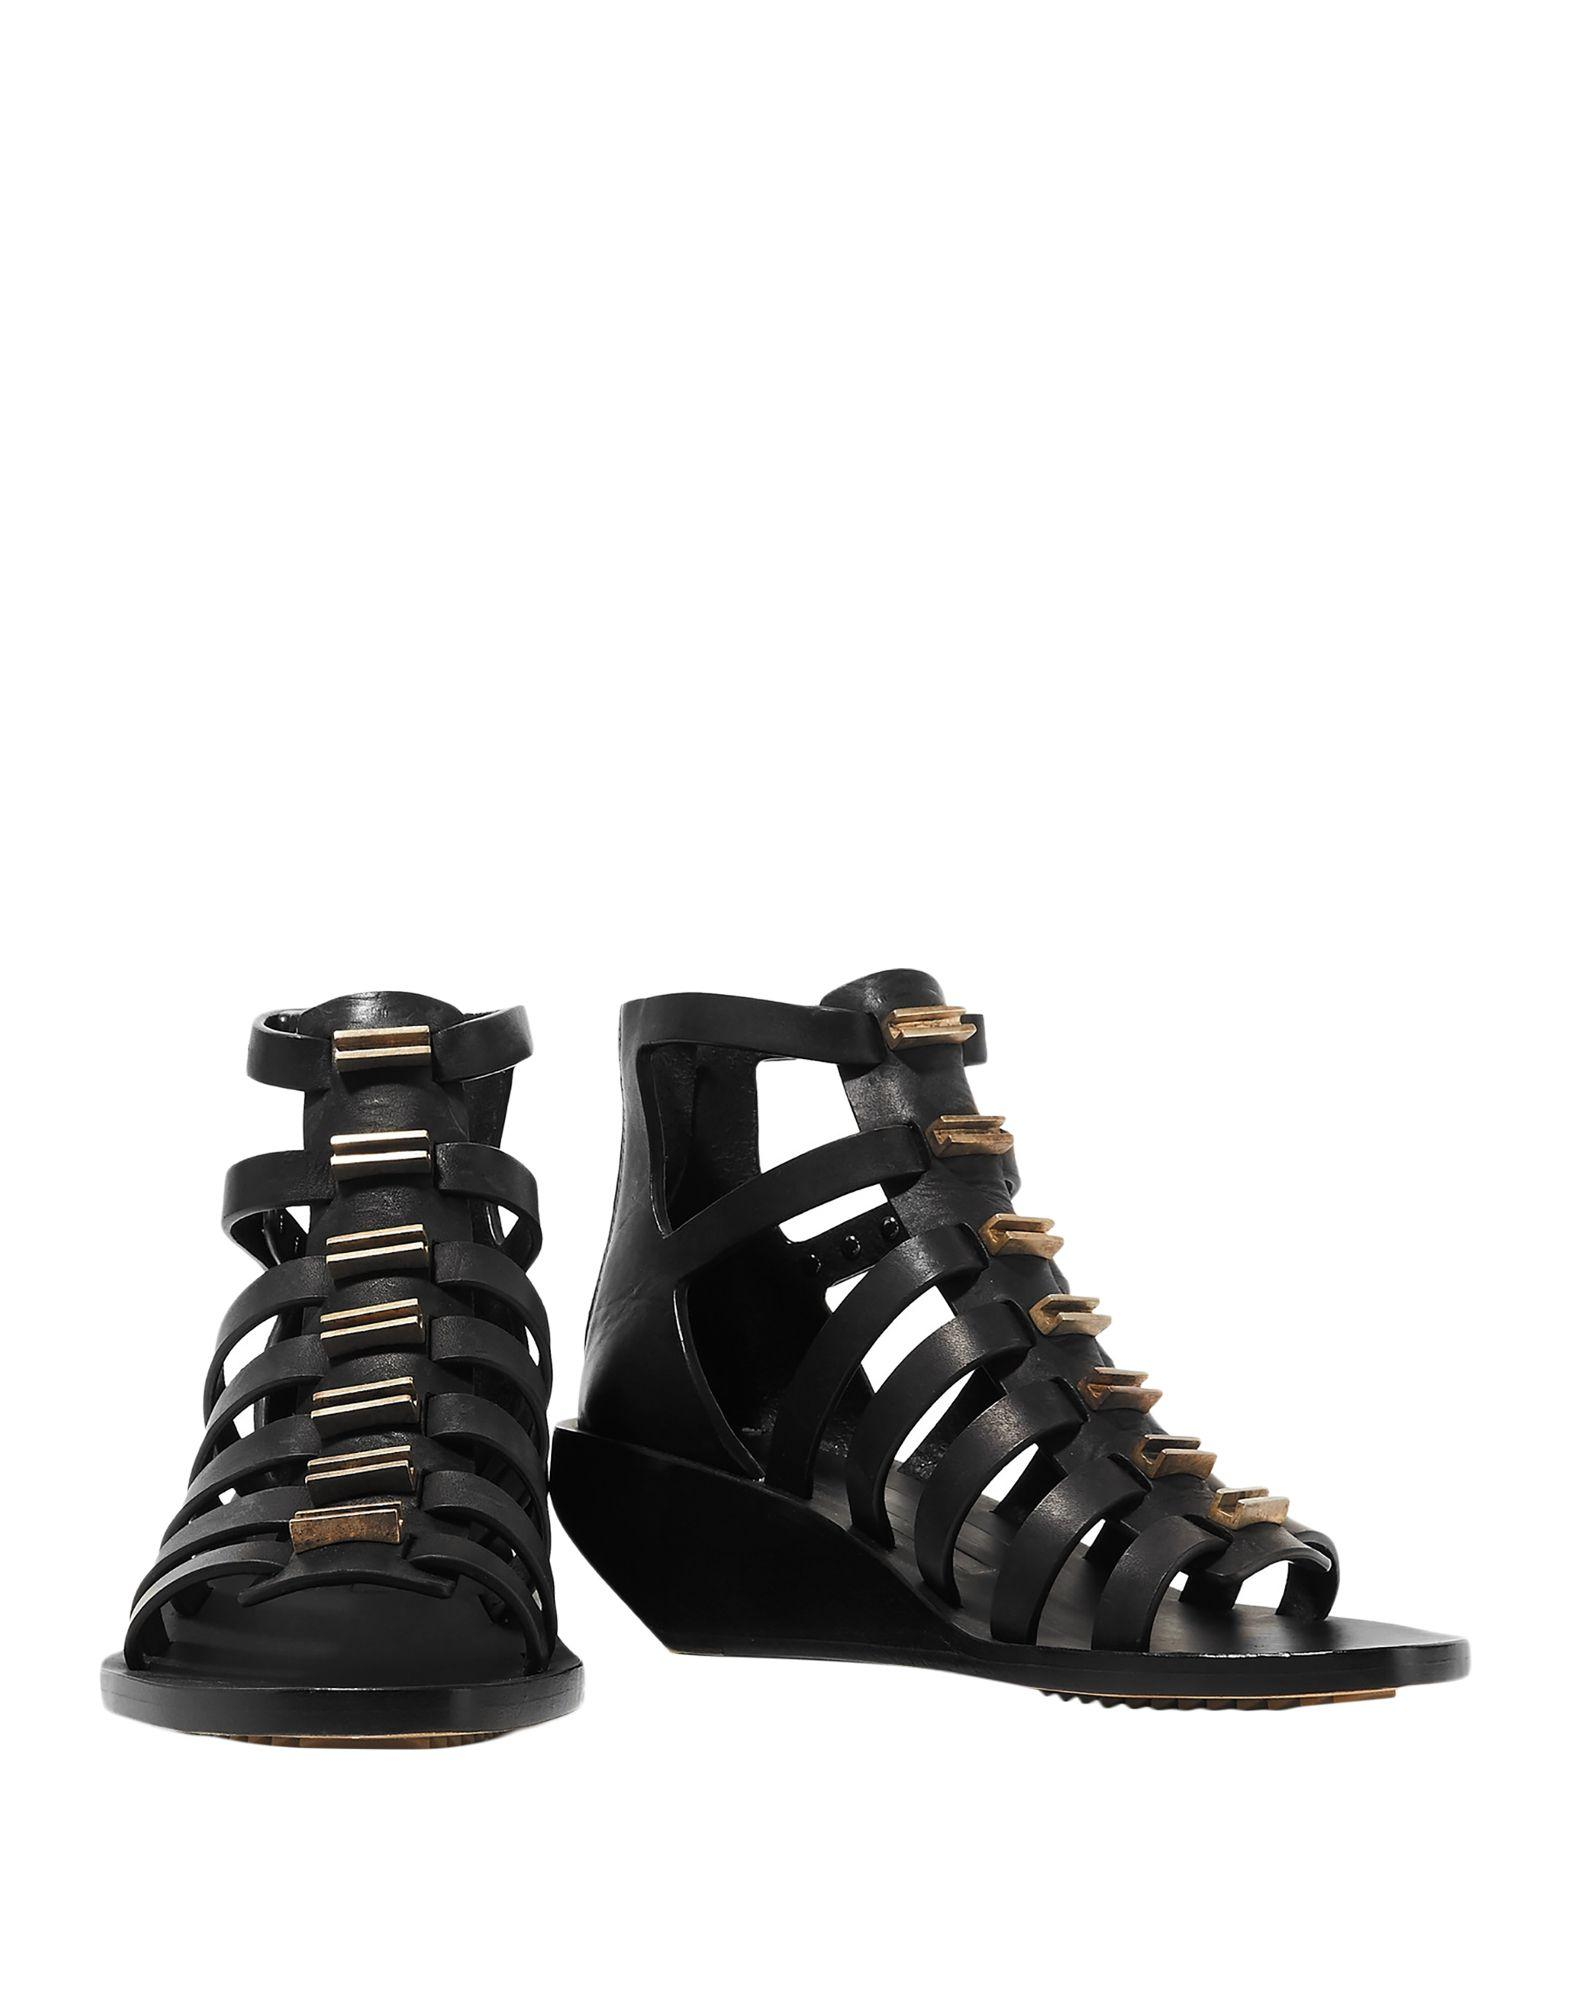 40dd70d58 Lyst - Rick Owens Sandals in Black